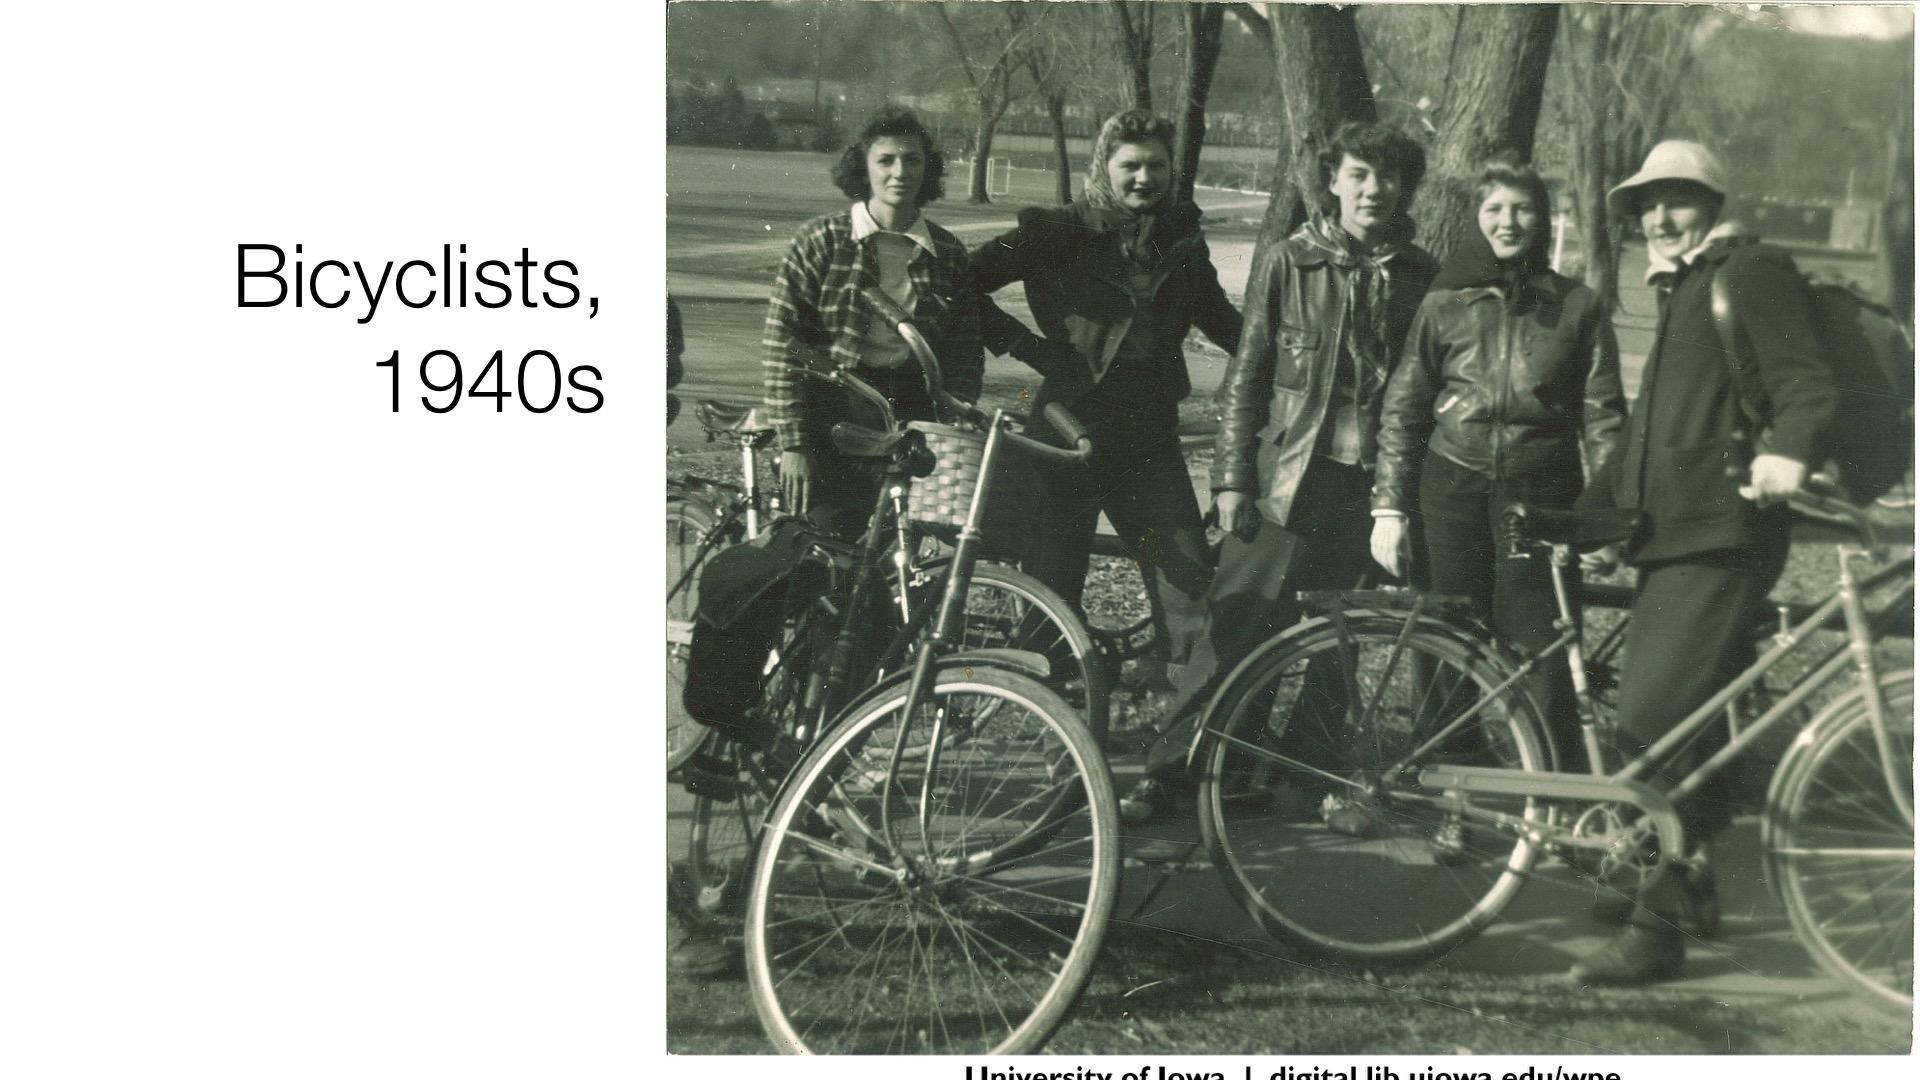 bicyclists, 1940s